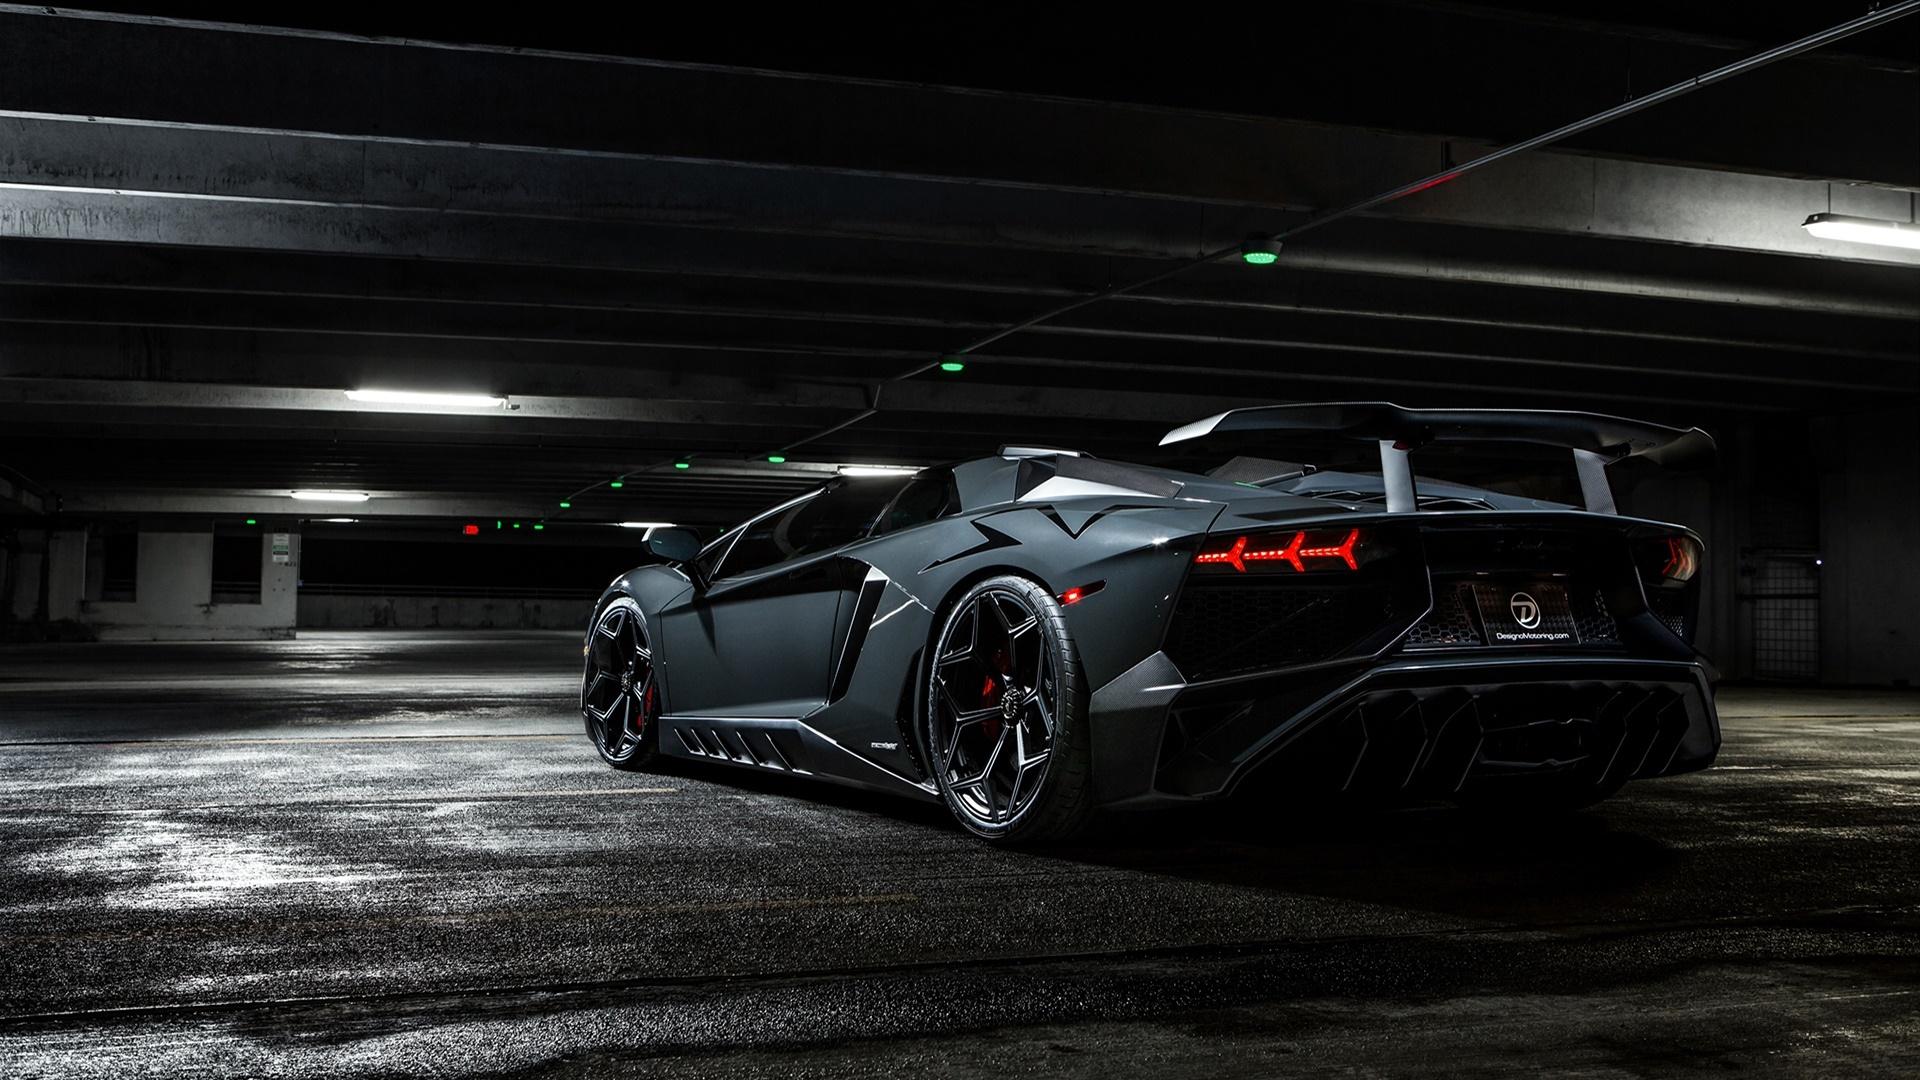 Lamborghini Aventador Sv Roadster Hd Wallpaper Backiee Free